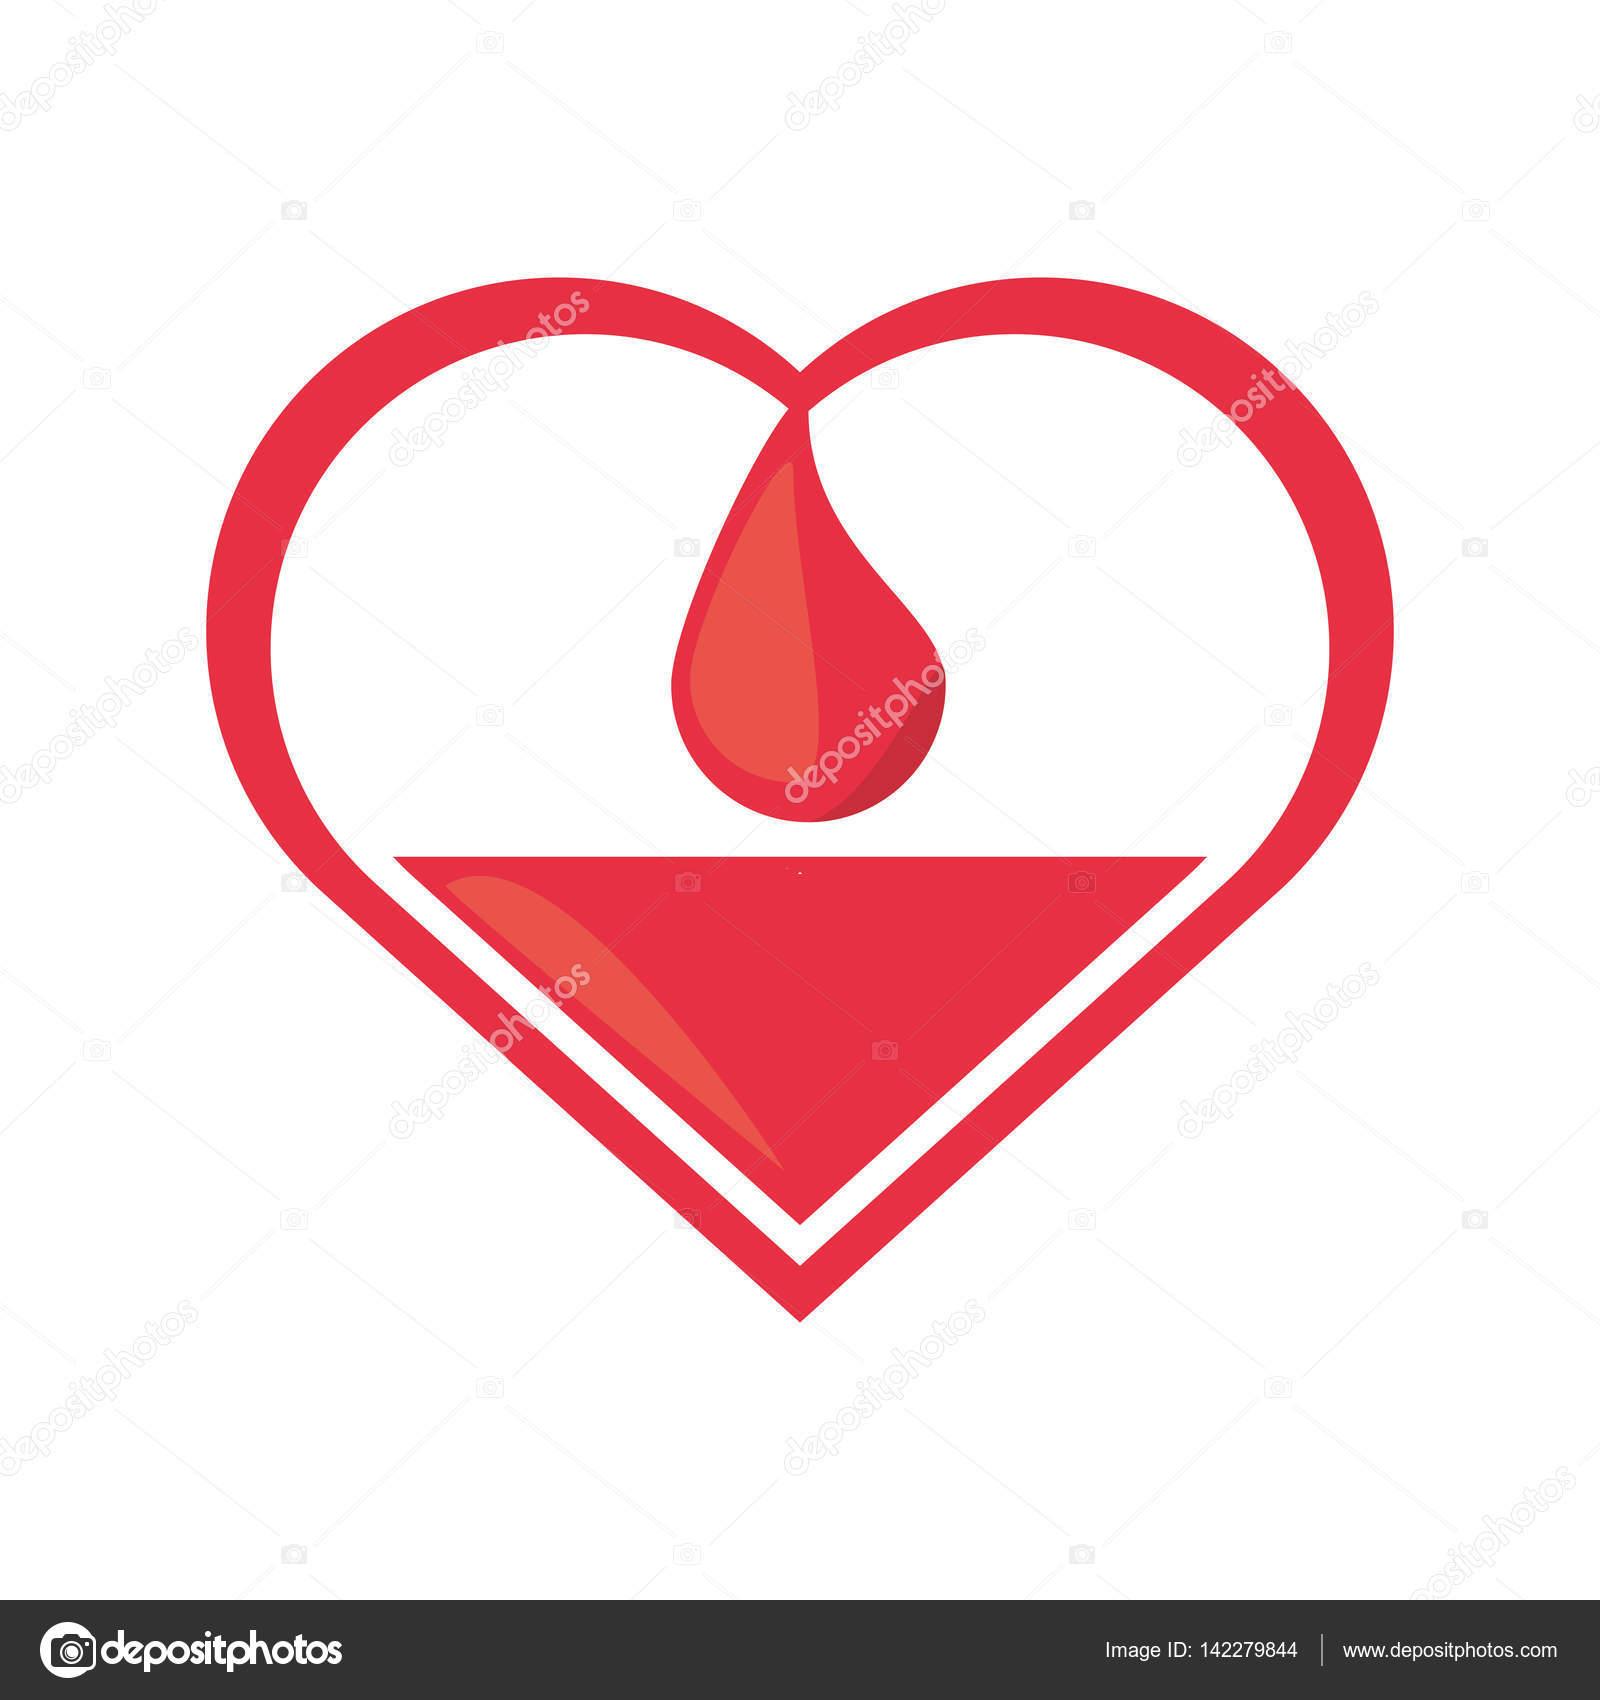 Heart drop blood donation symbol stock vector djv 142279844 heart drop blood donation symbol stock vector buycottarizona